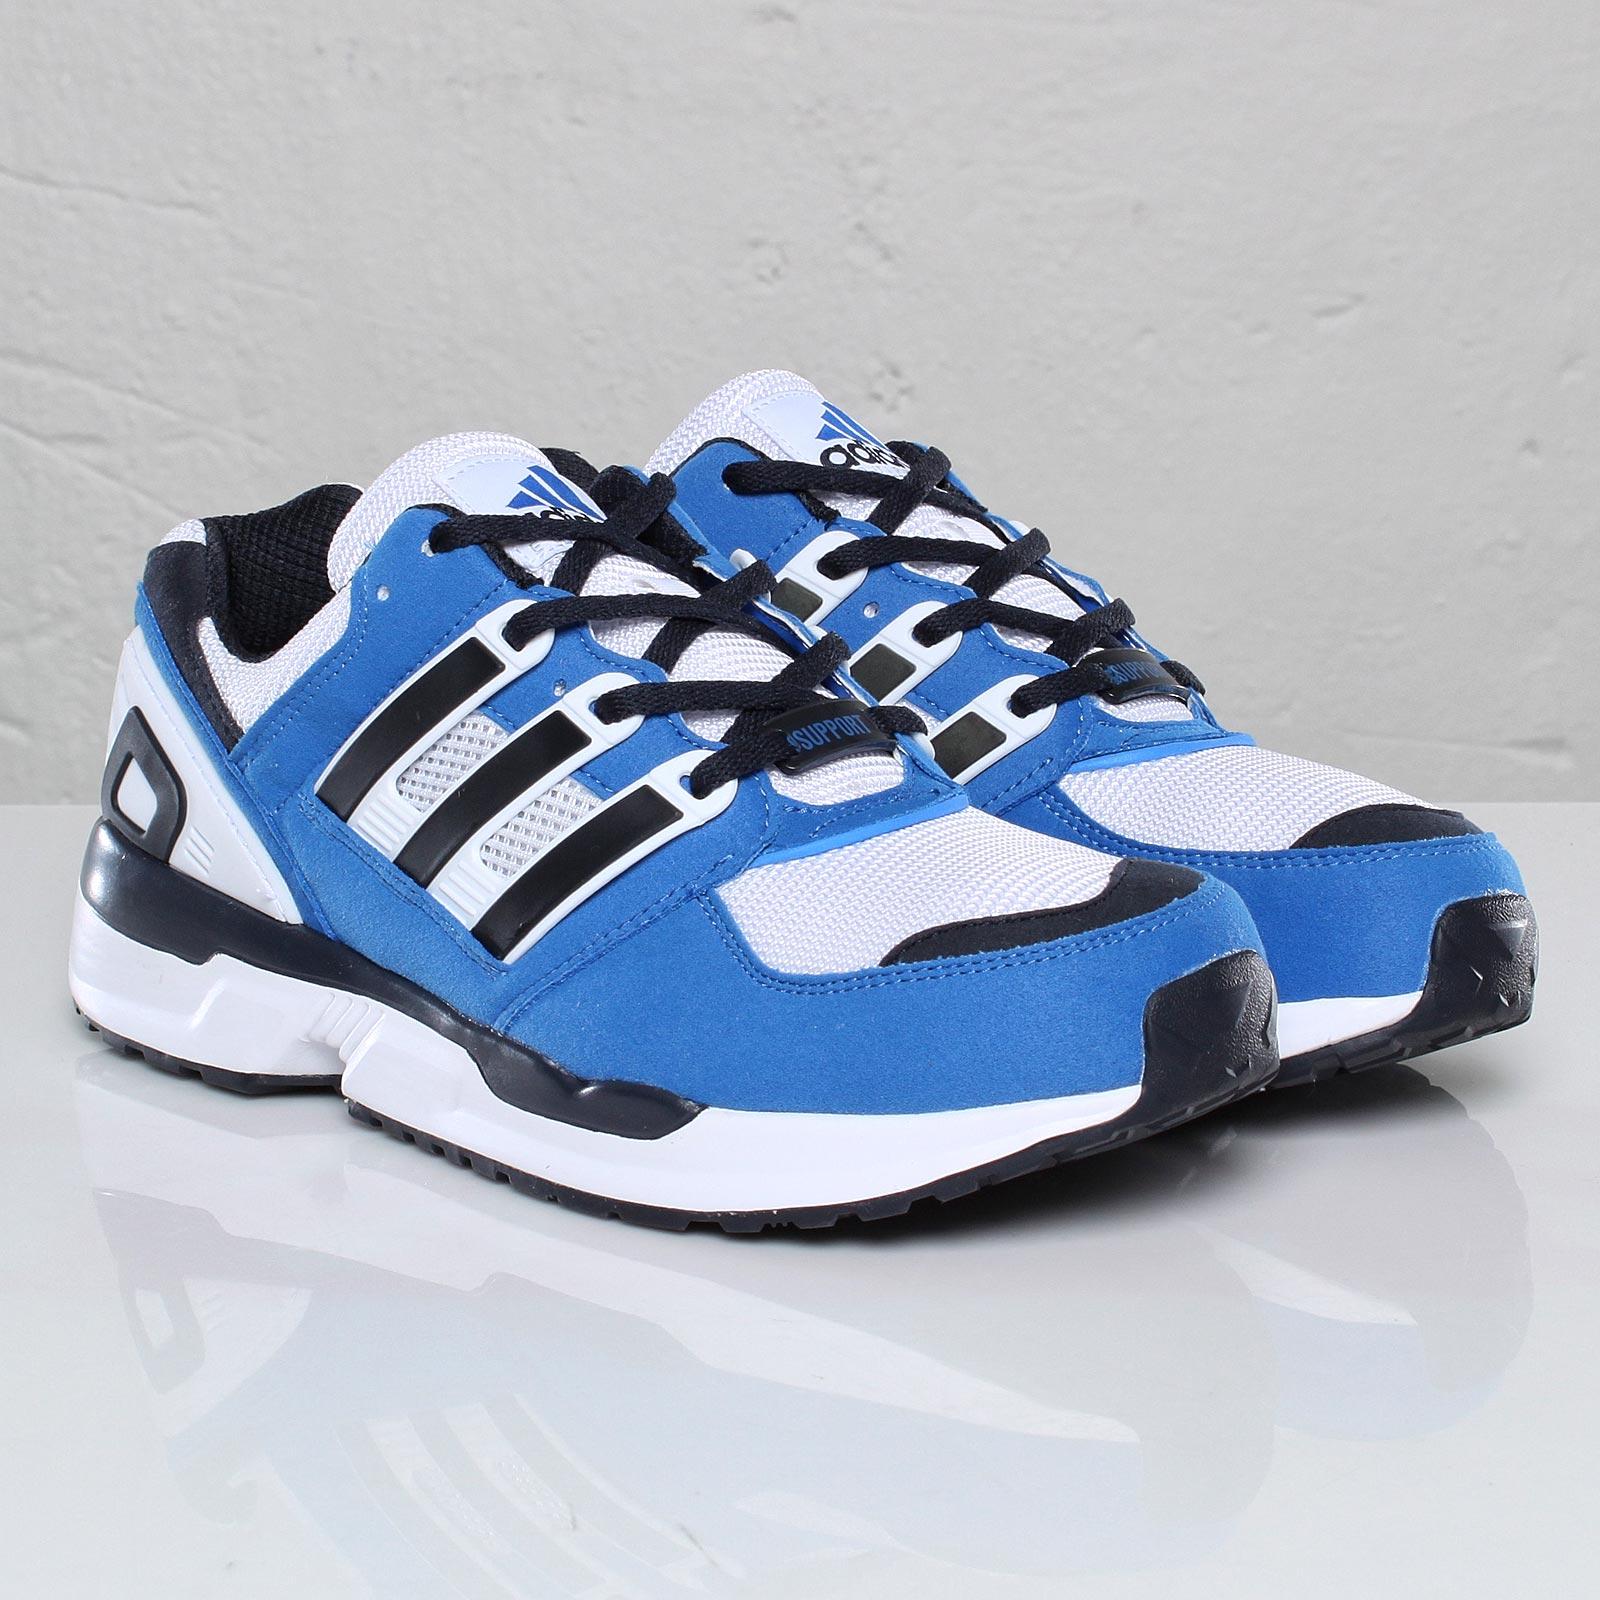 adidas EQT Support Support EQT Corriendo | 101715 Sneakersnstuff | 29de6e0 - hvorvikankobe.website